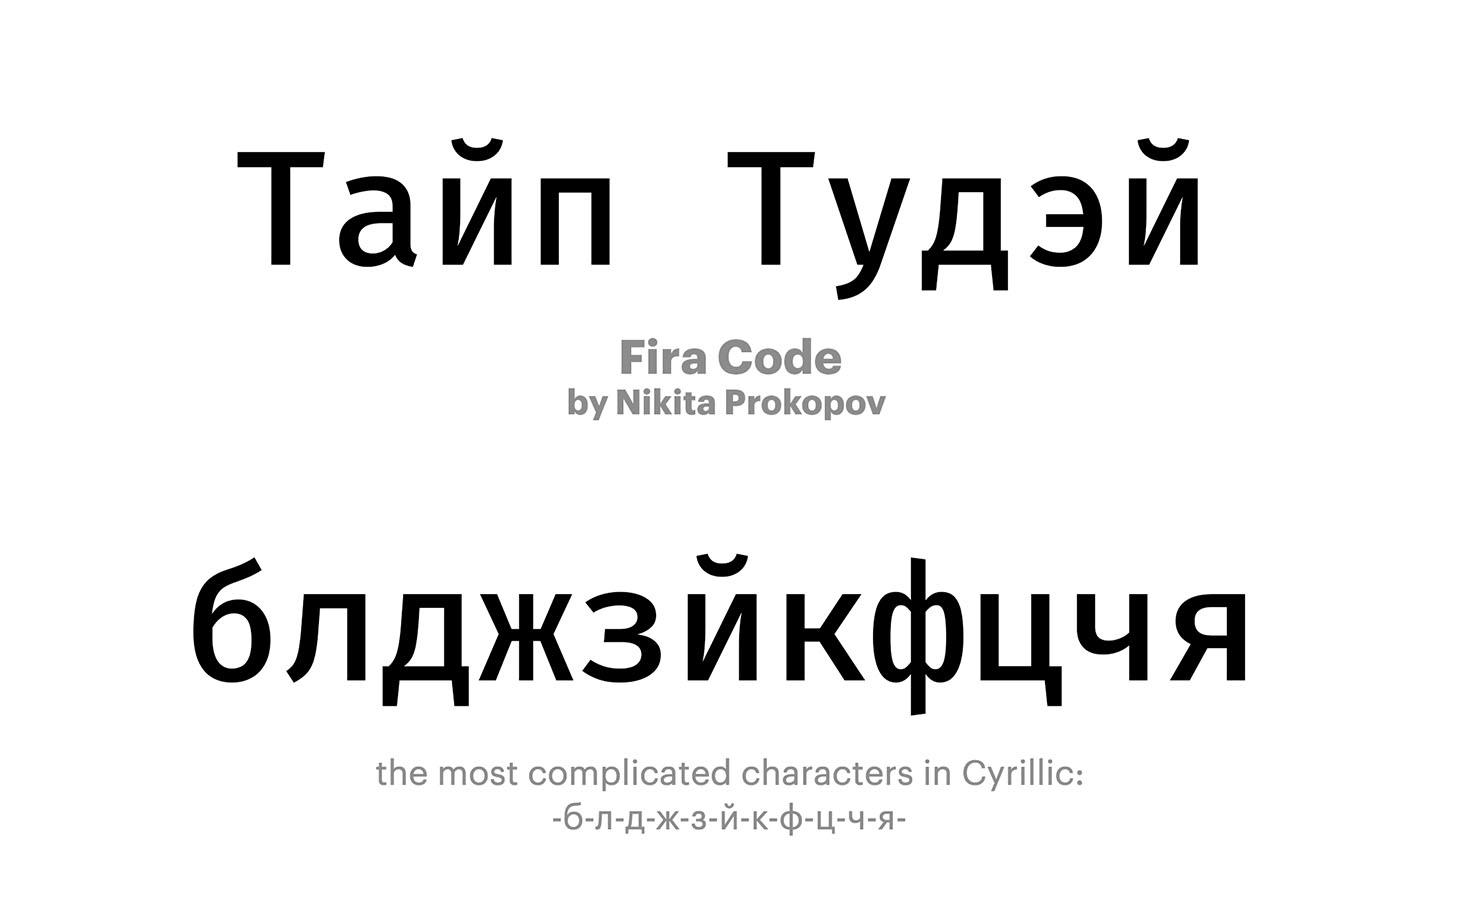 Fira-Code